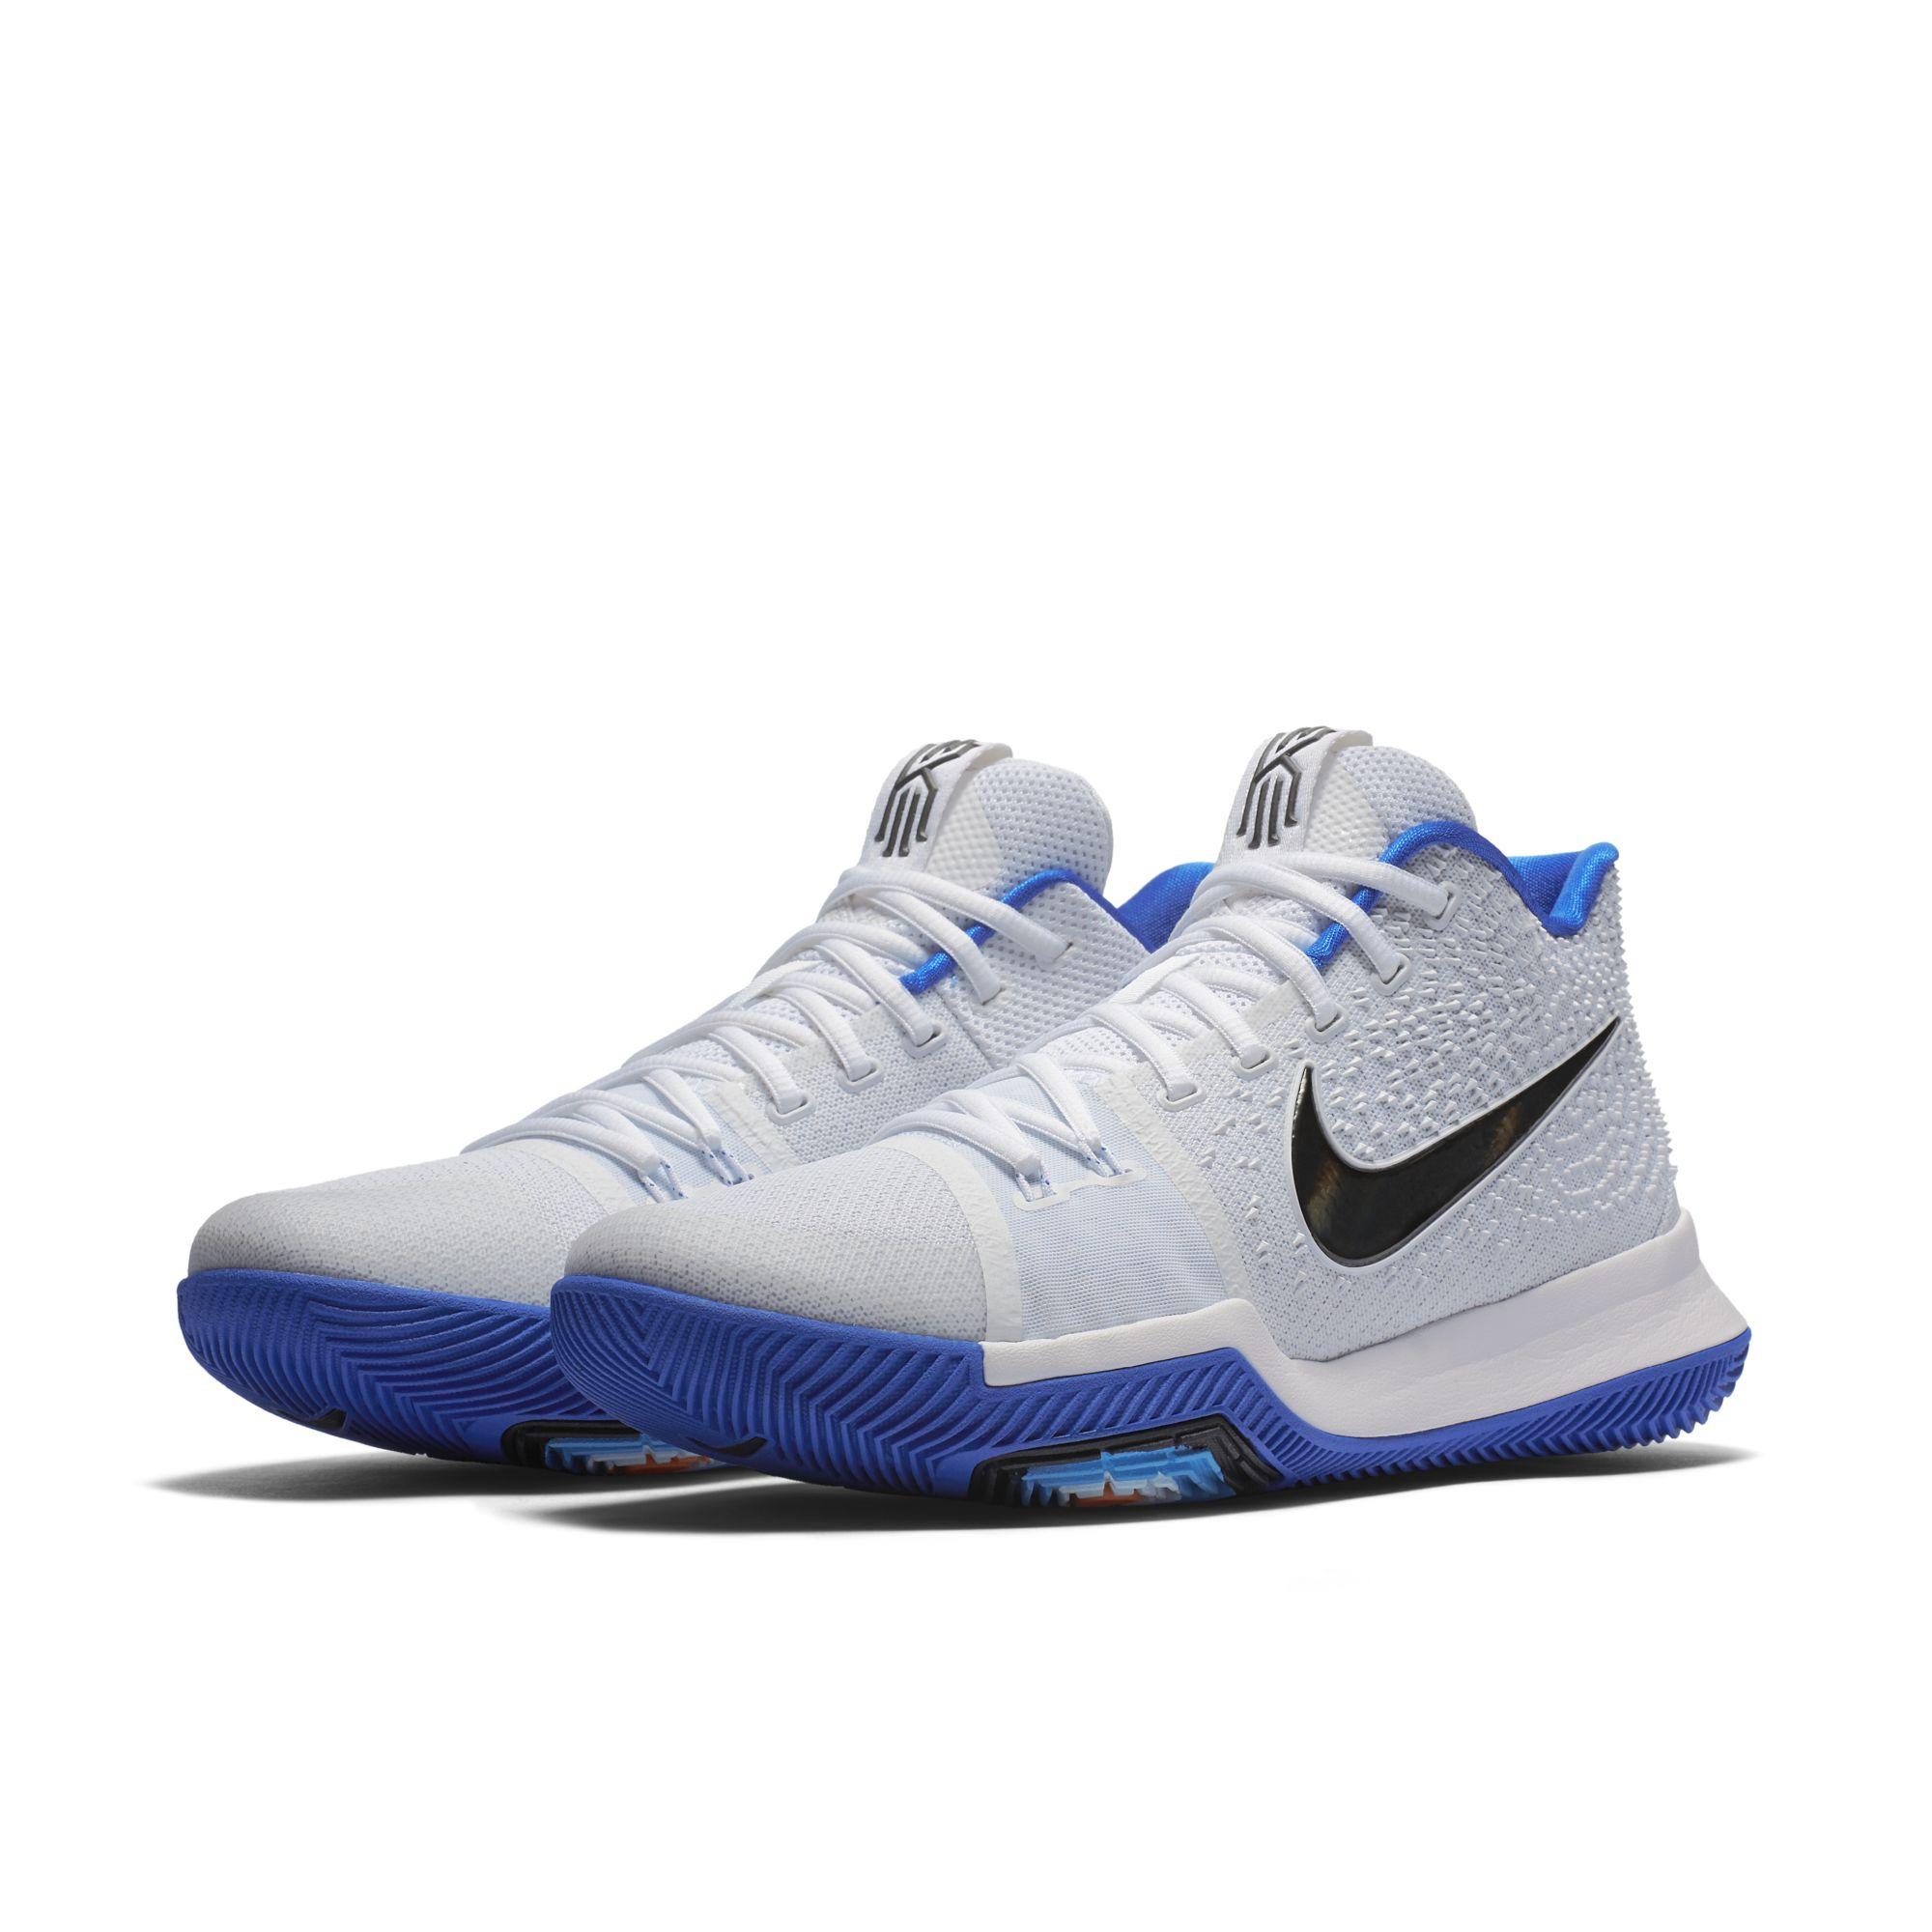 Best Nike Hyper Basketball Shoes